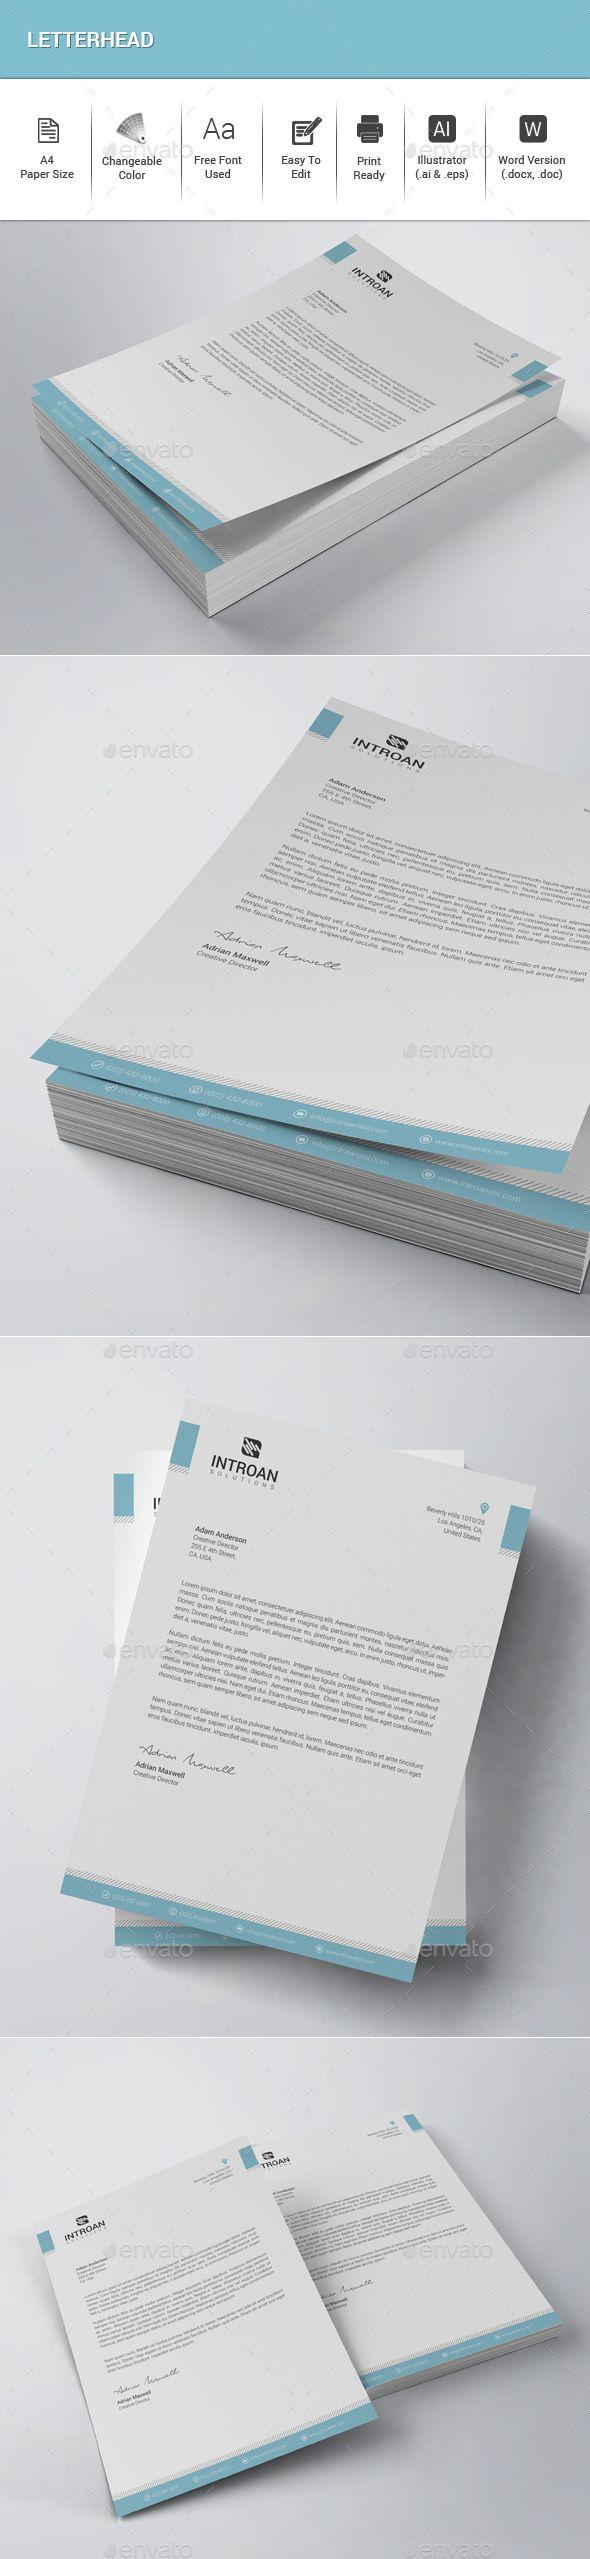 Business Letter Templates Word%0A Letterhead